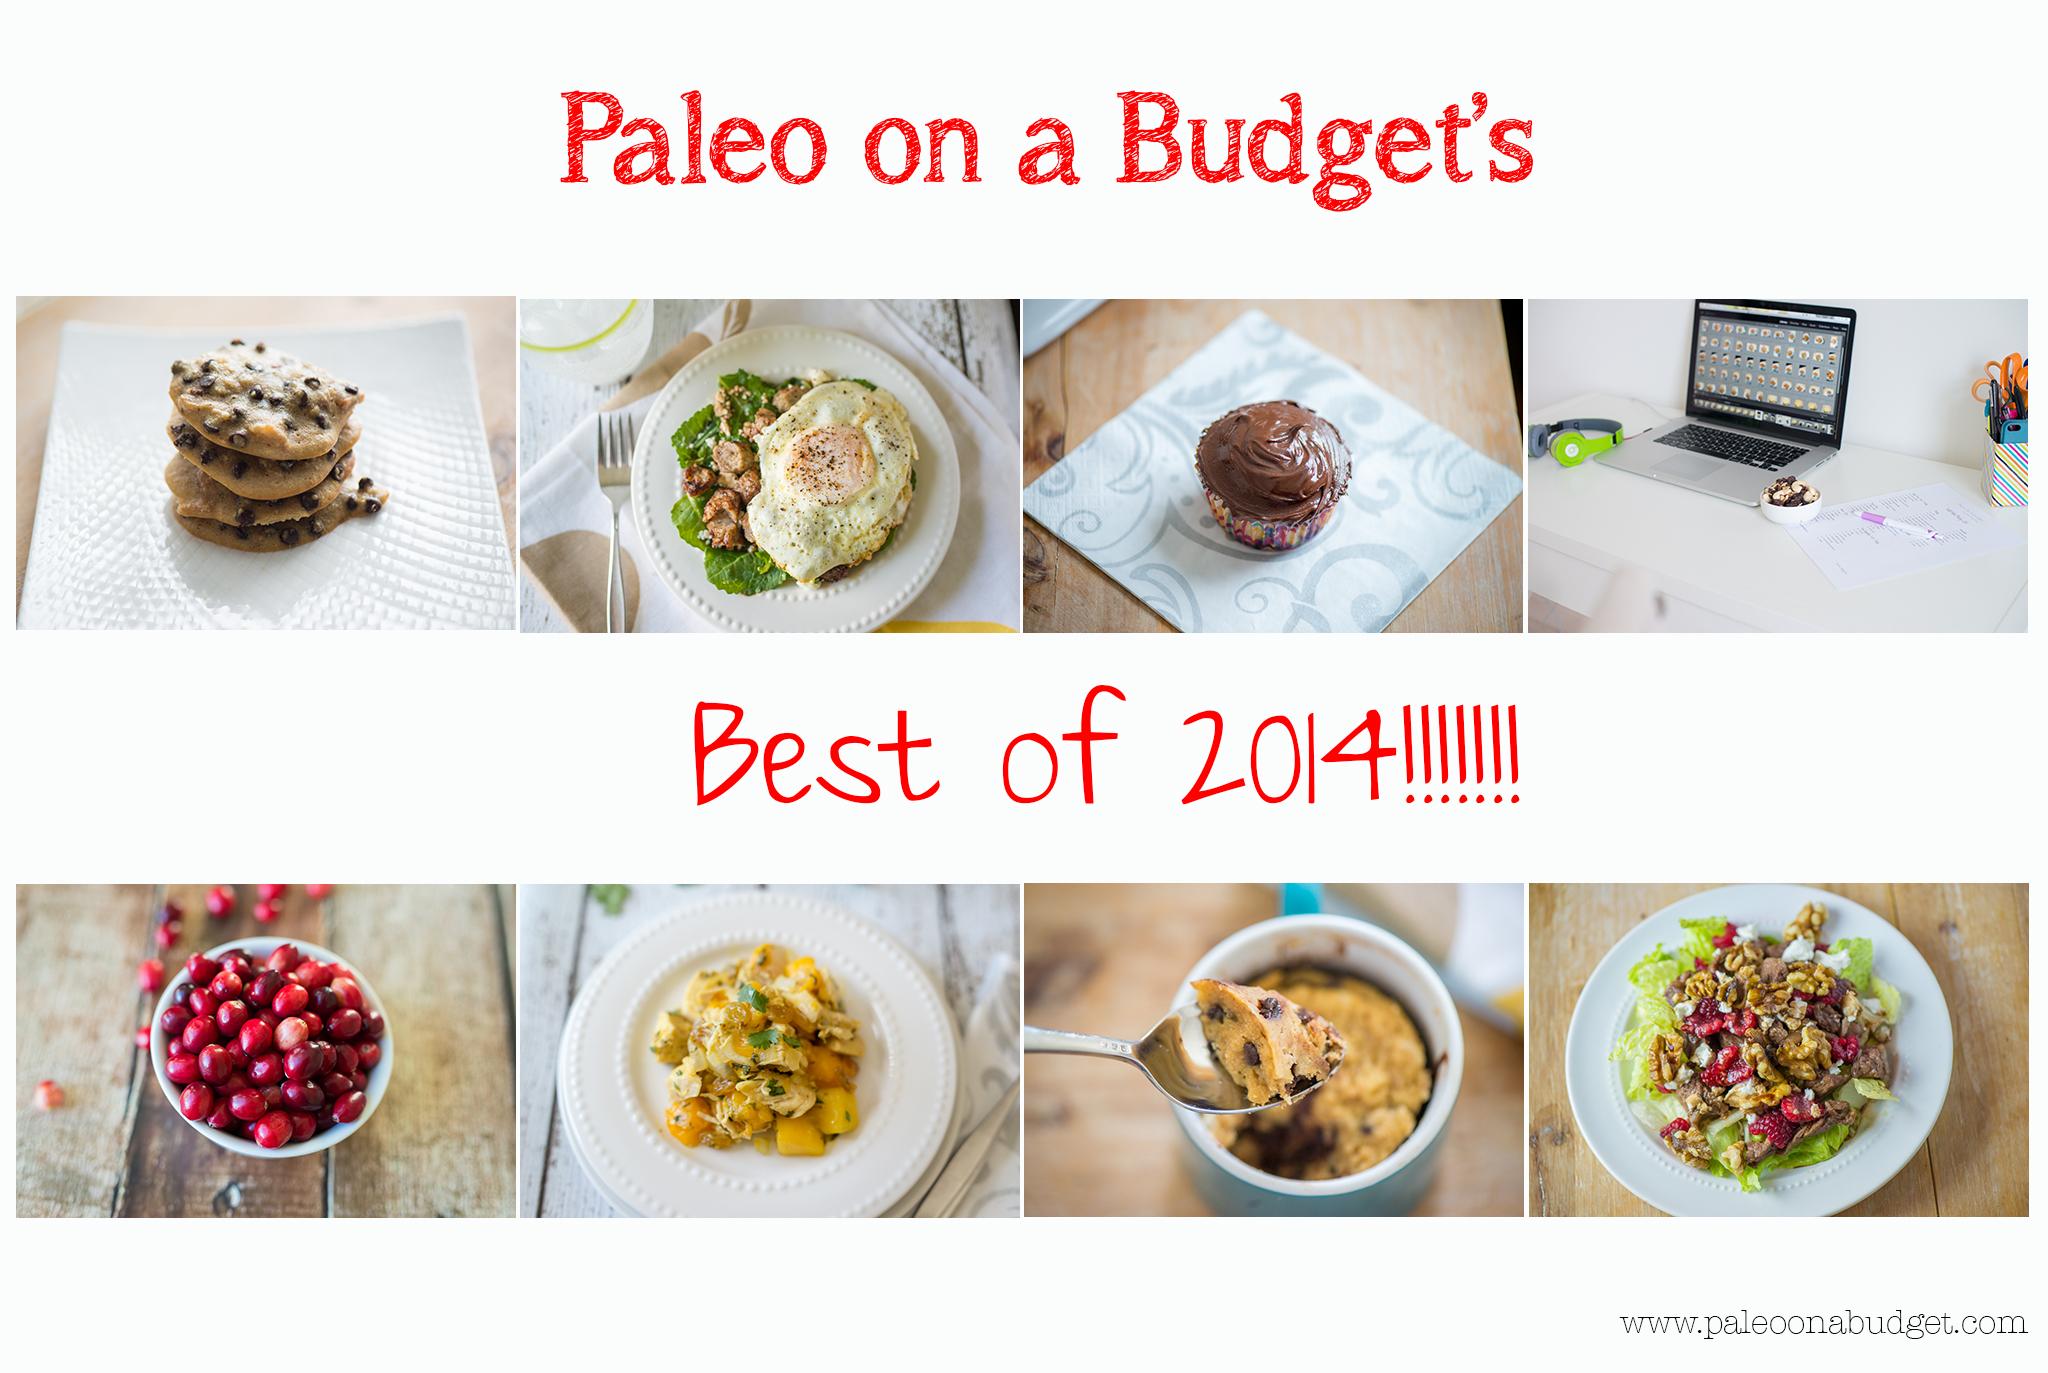 Best of 2014 – POAB Style